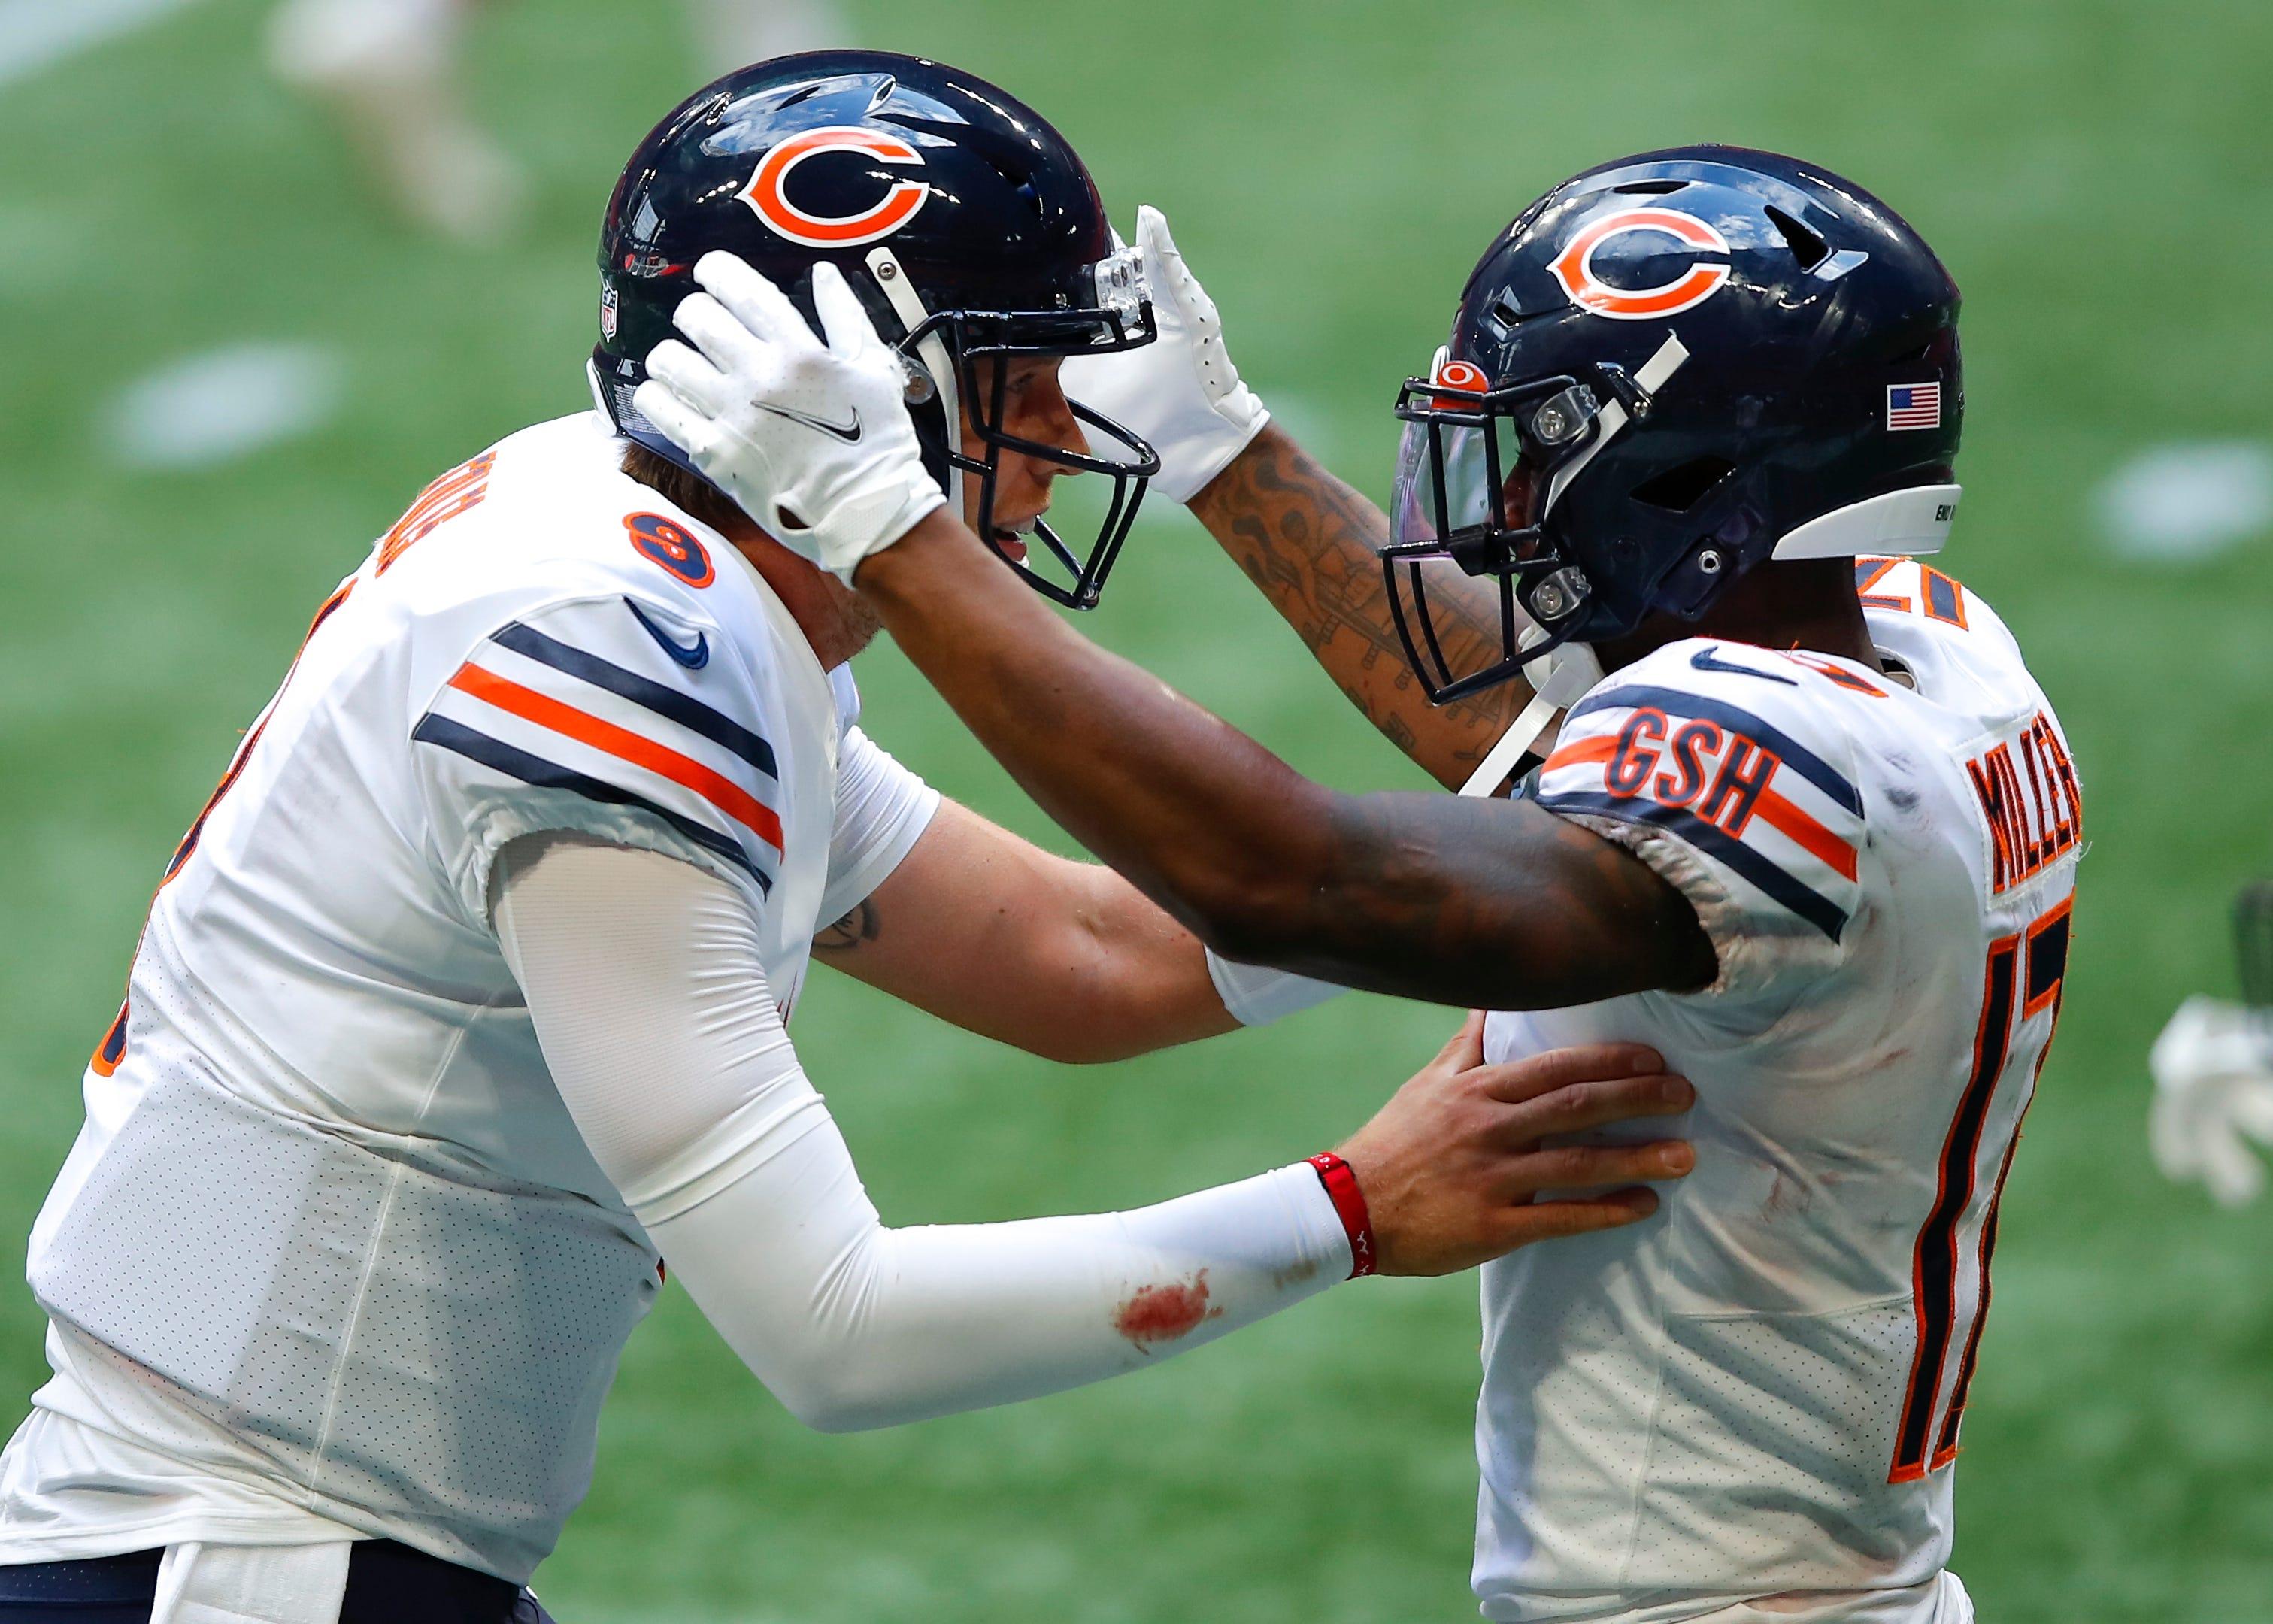 Nick Foles sparks Chicago Bears to fourth-quarter comeback as Atlanta Falcons collapse late again